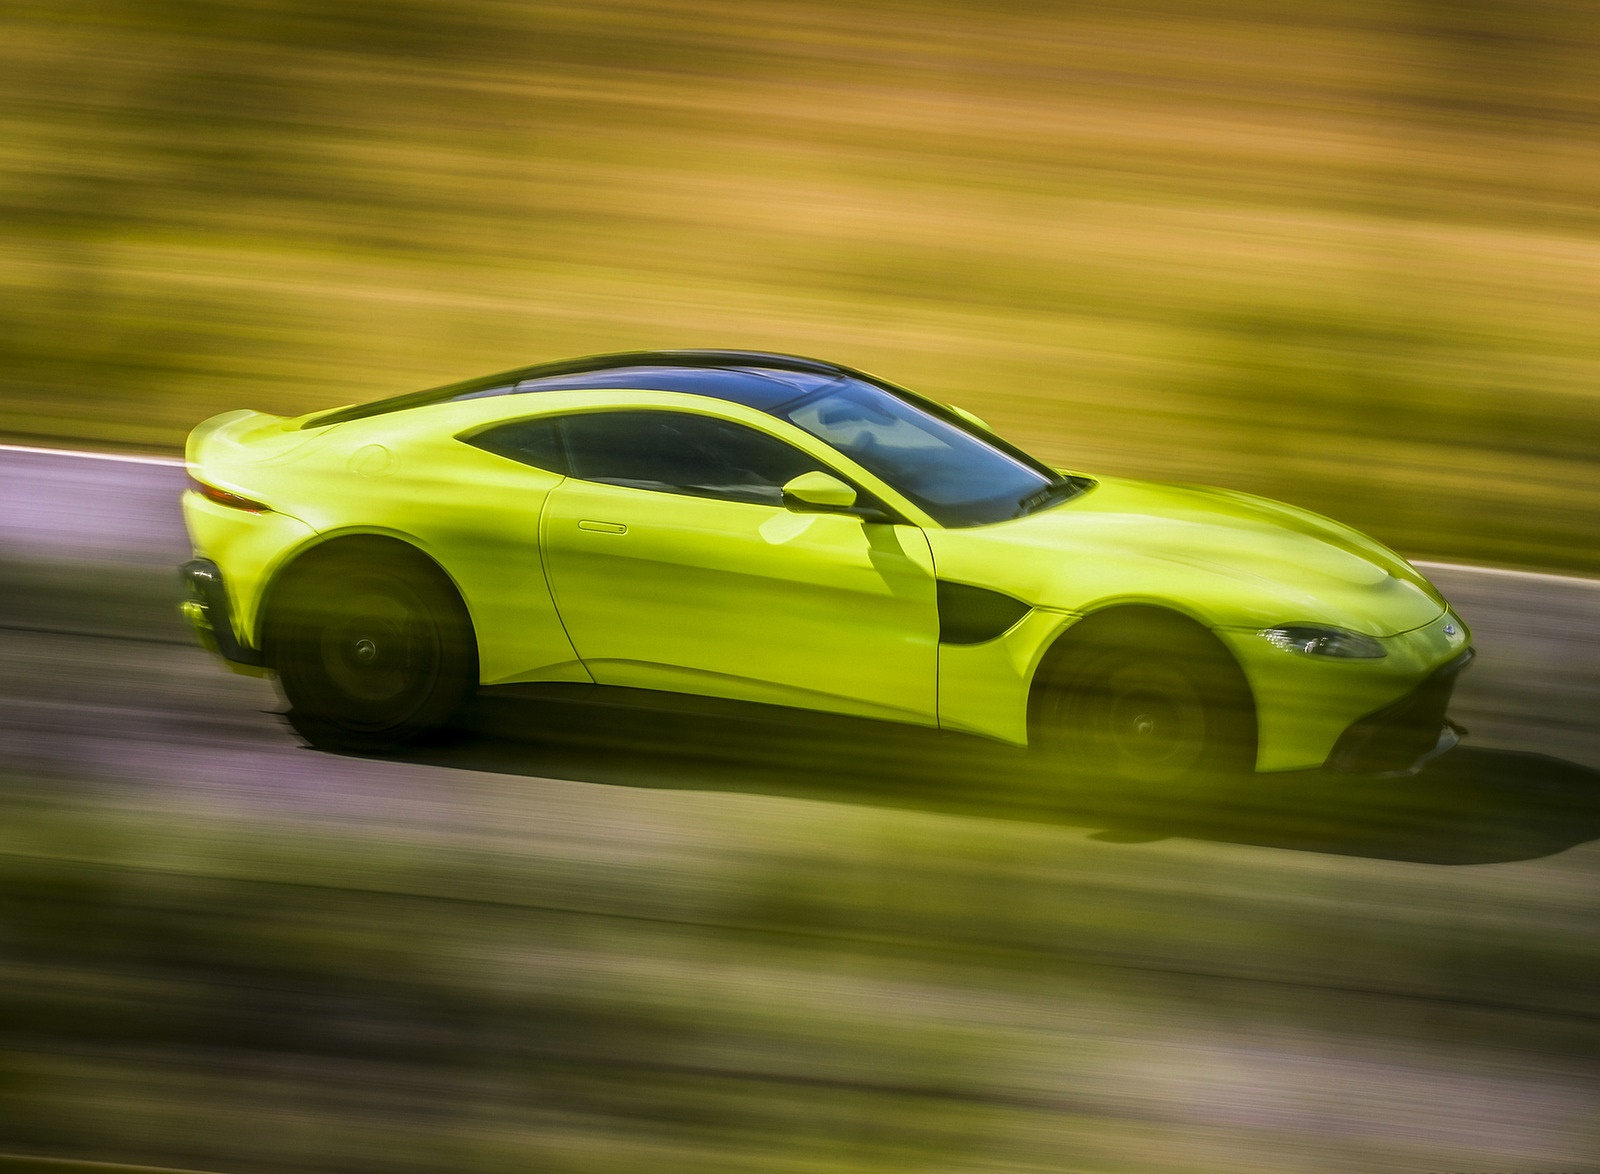 2019 Aston Martin Vantage Side Wallpapers (6)